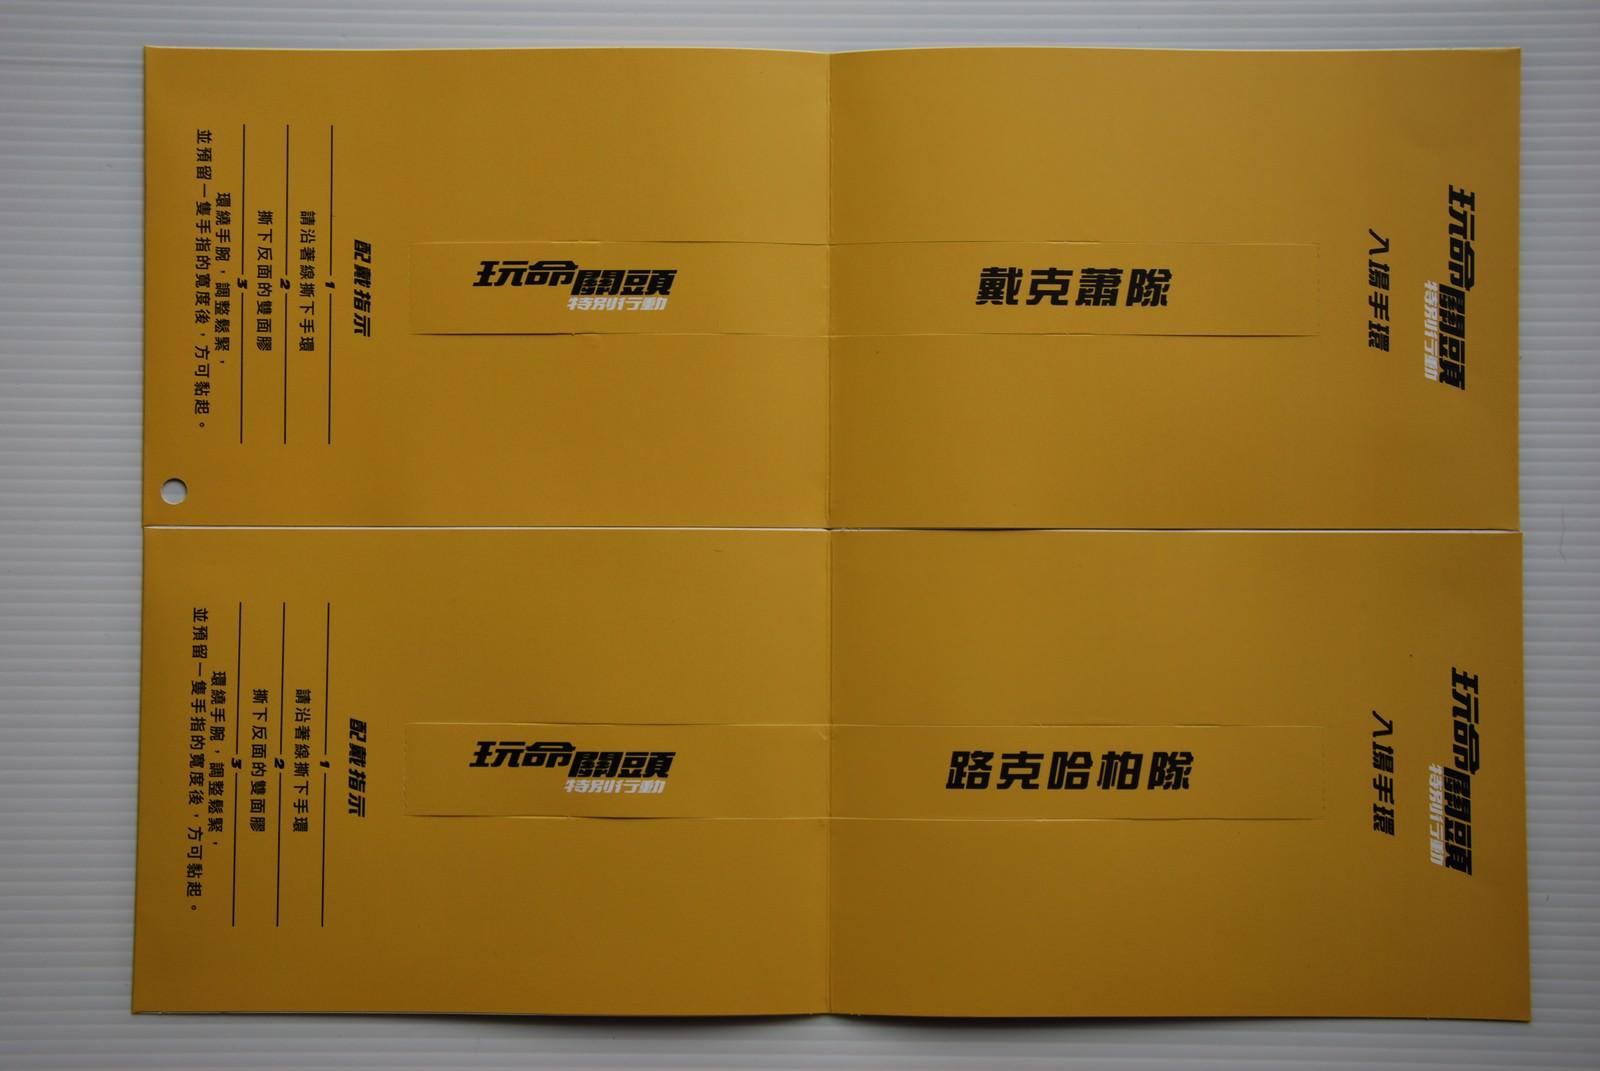 Movie, Fast & Furious Presents: Hobbs & Shaw(美國, 2019年) / 玩命關頭:特別行動(台灣) / 速度与激情:特别行动(中國) / 狂野時速:雙雄聯盟(香港), 特映會邀請卡